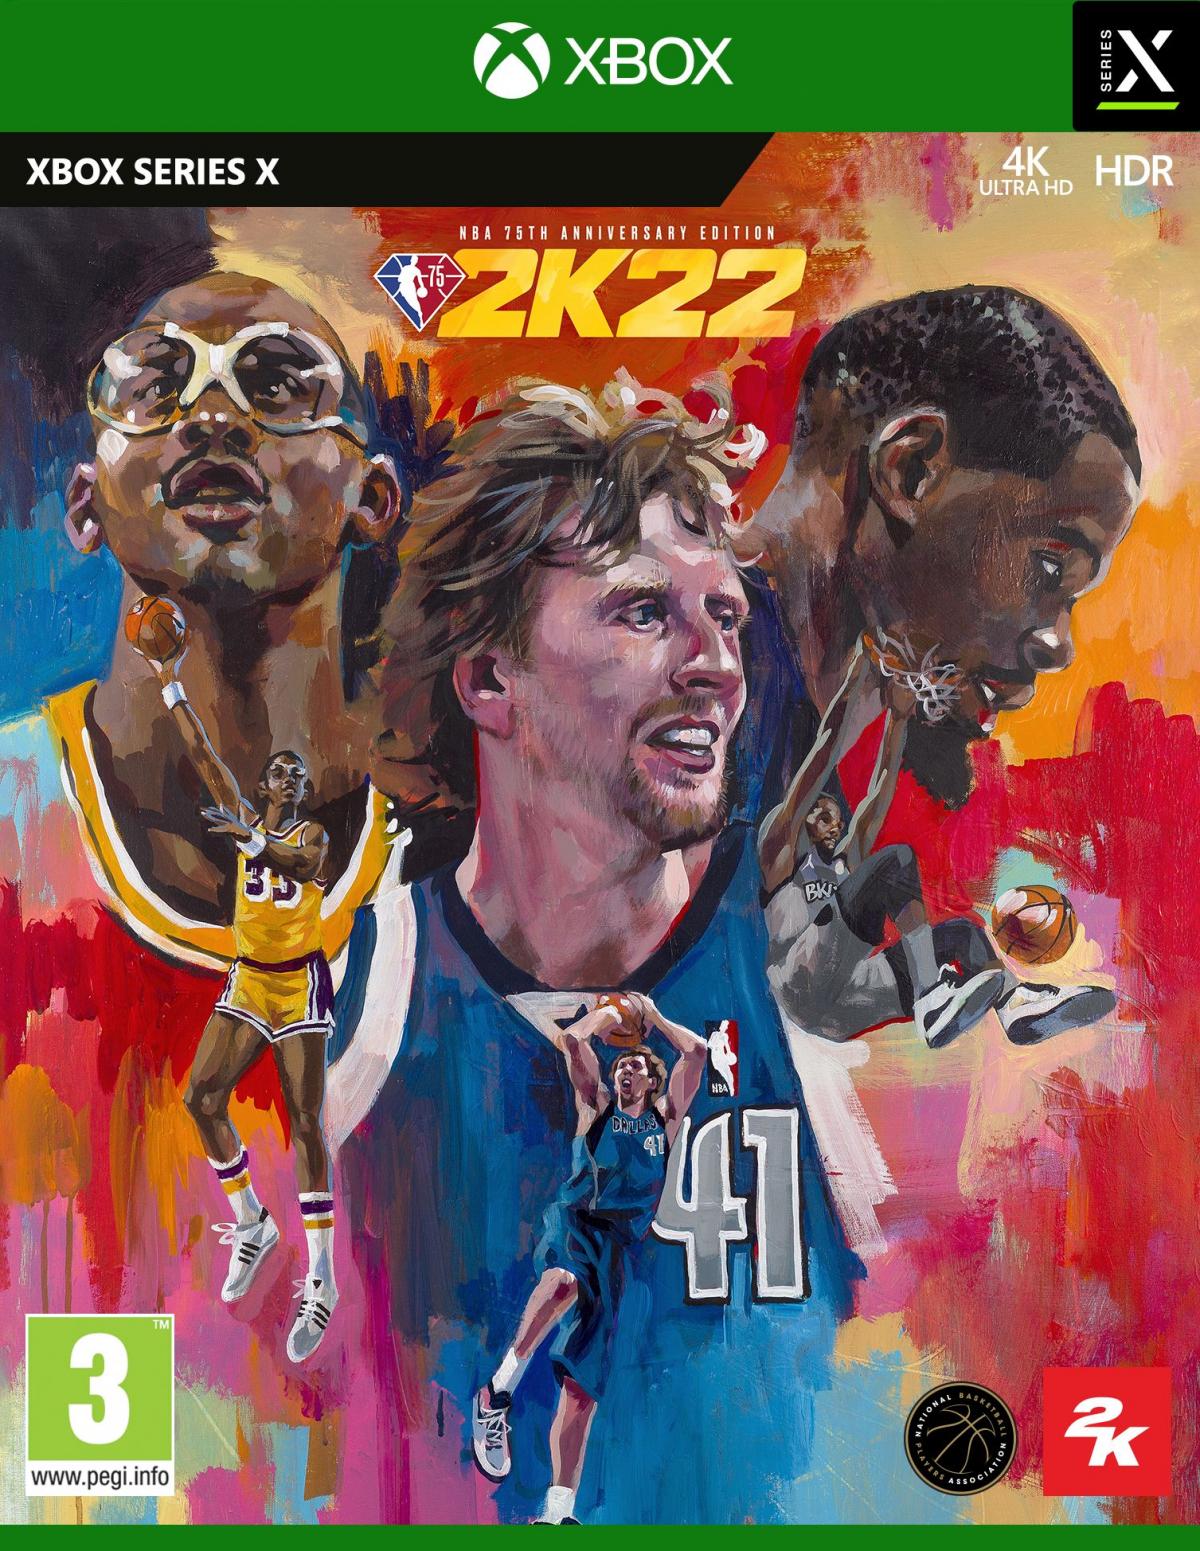 XBOXSeriesX NBA 2K22 75th Anniversary